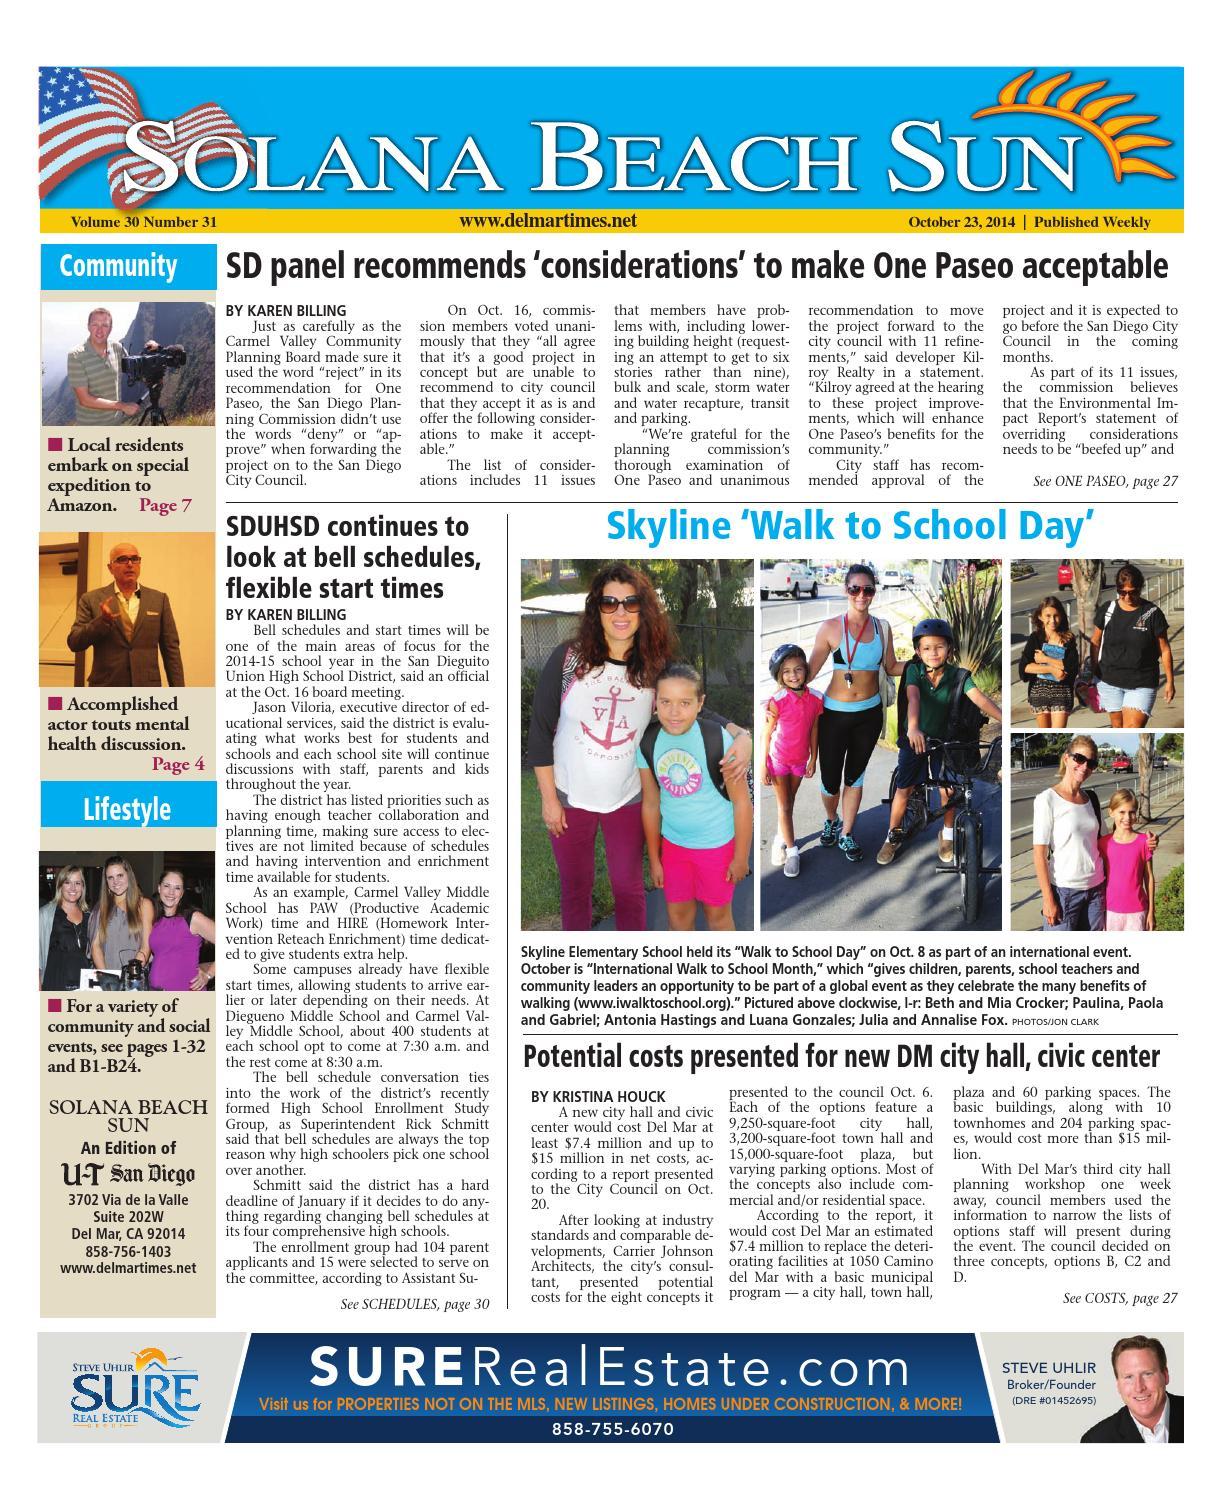 Solana beach sun 10 23 14 by mainstreet media issuu aiddatafo Choice Image